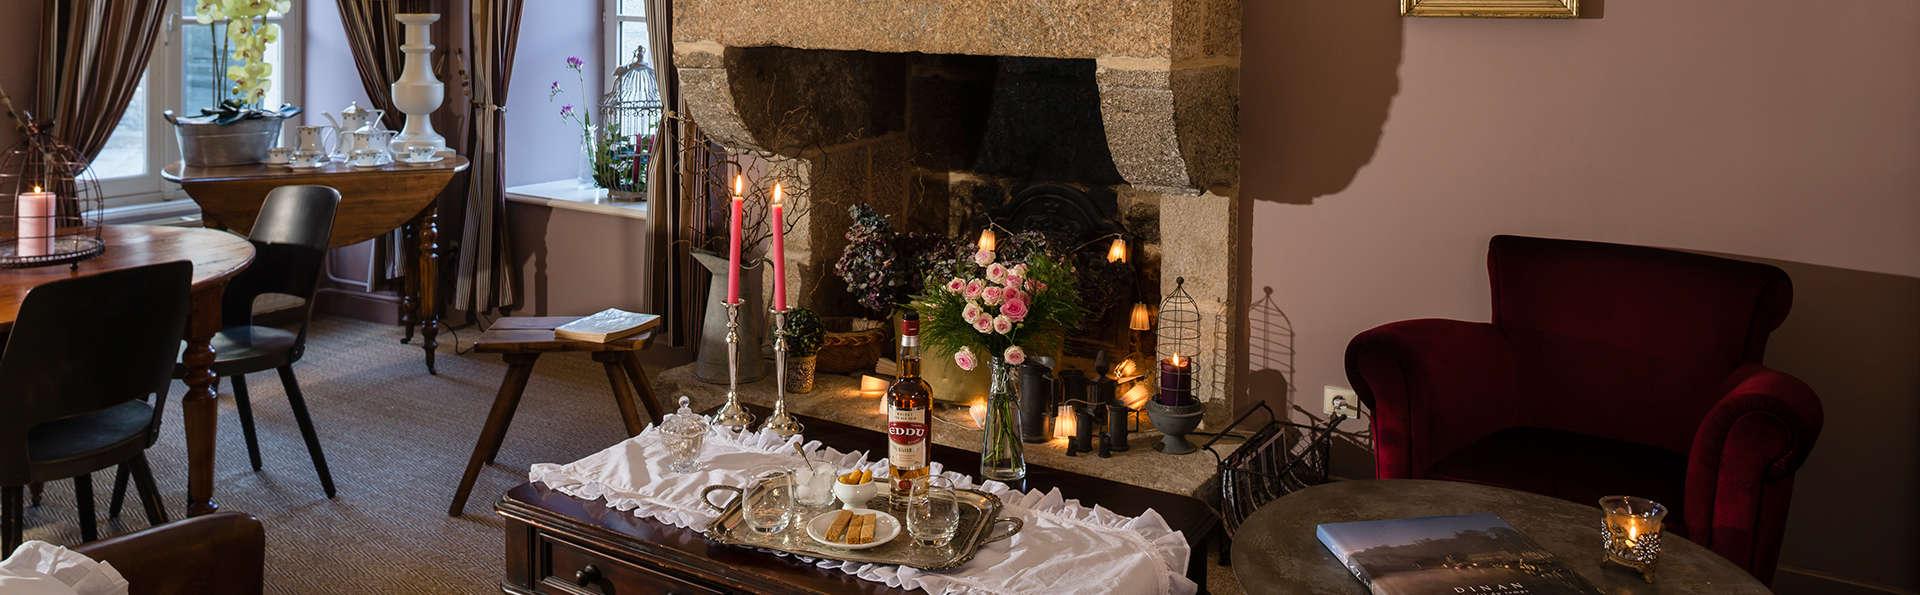 Week-end romantique à Dinan